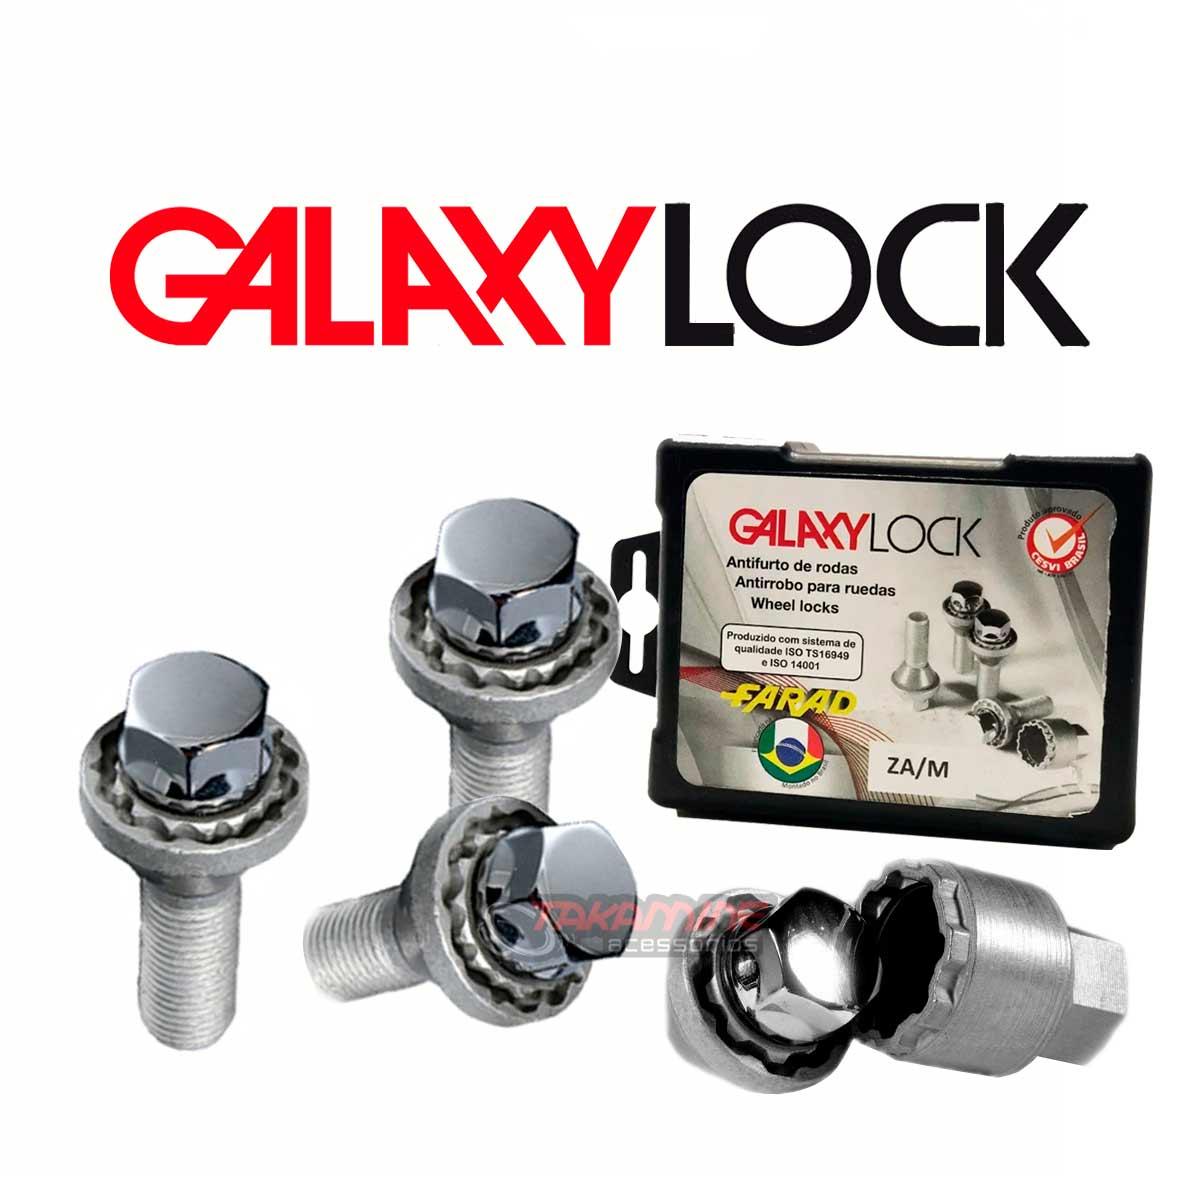 Parafuso antifurto para rodas Galaxy Lock Tiggo 2 (roda de liga)